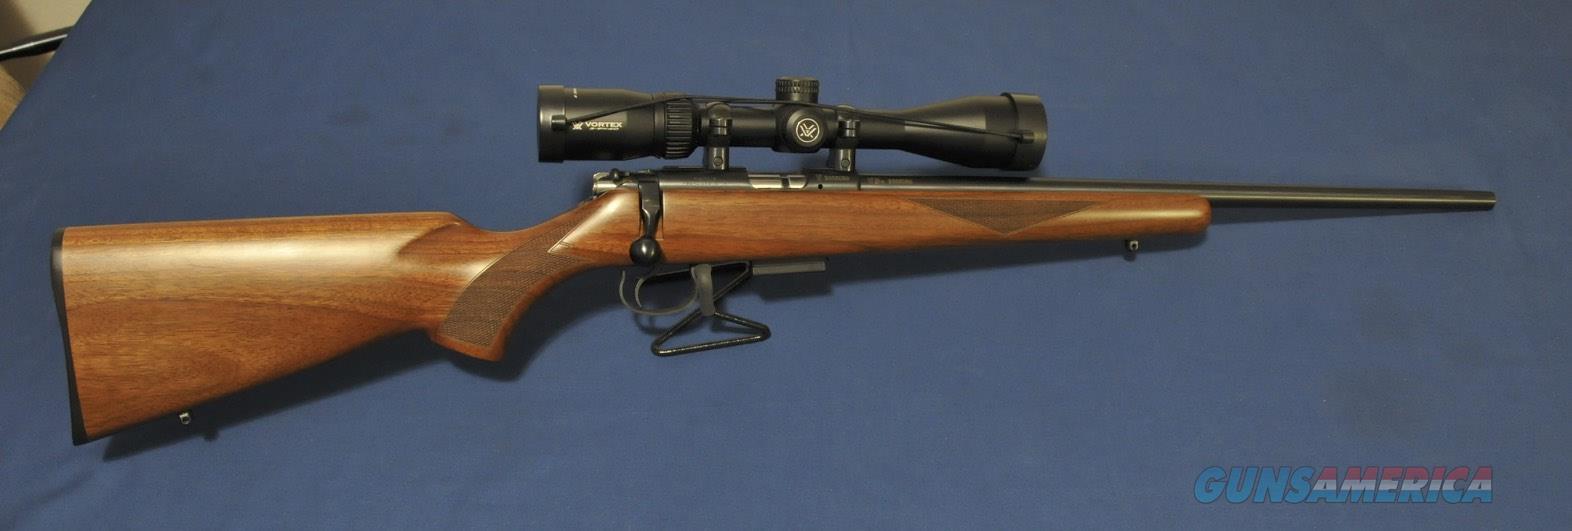 CZ 455 American .17 HMR Blue/Walnut  Guns > Rifles > CZ Rifles